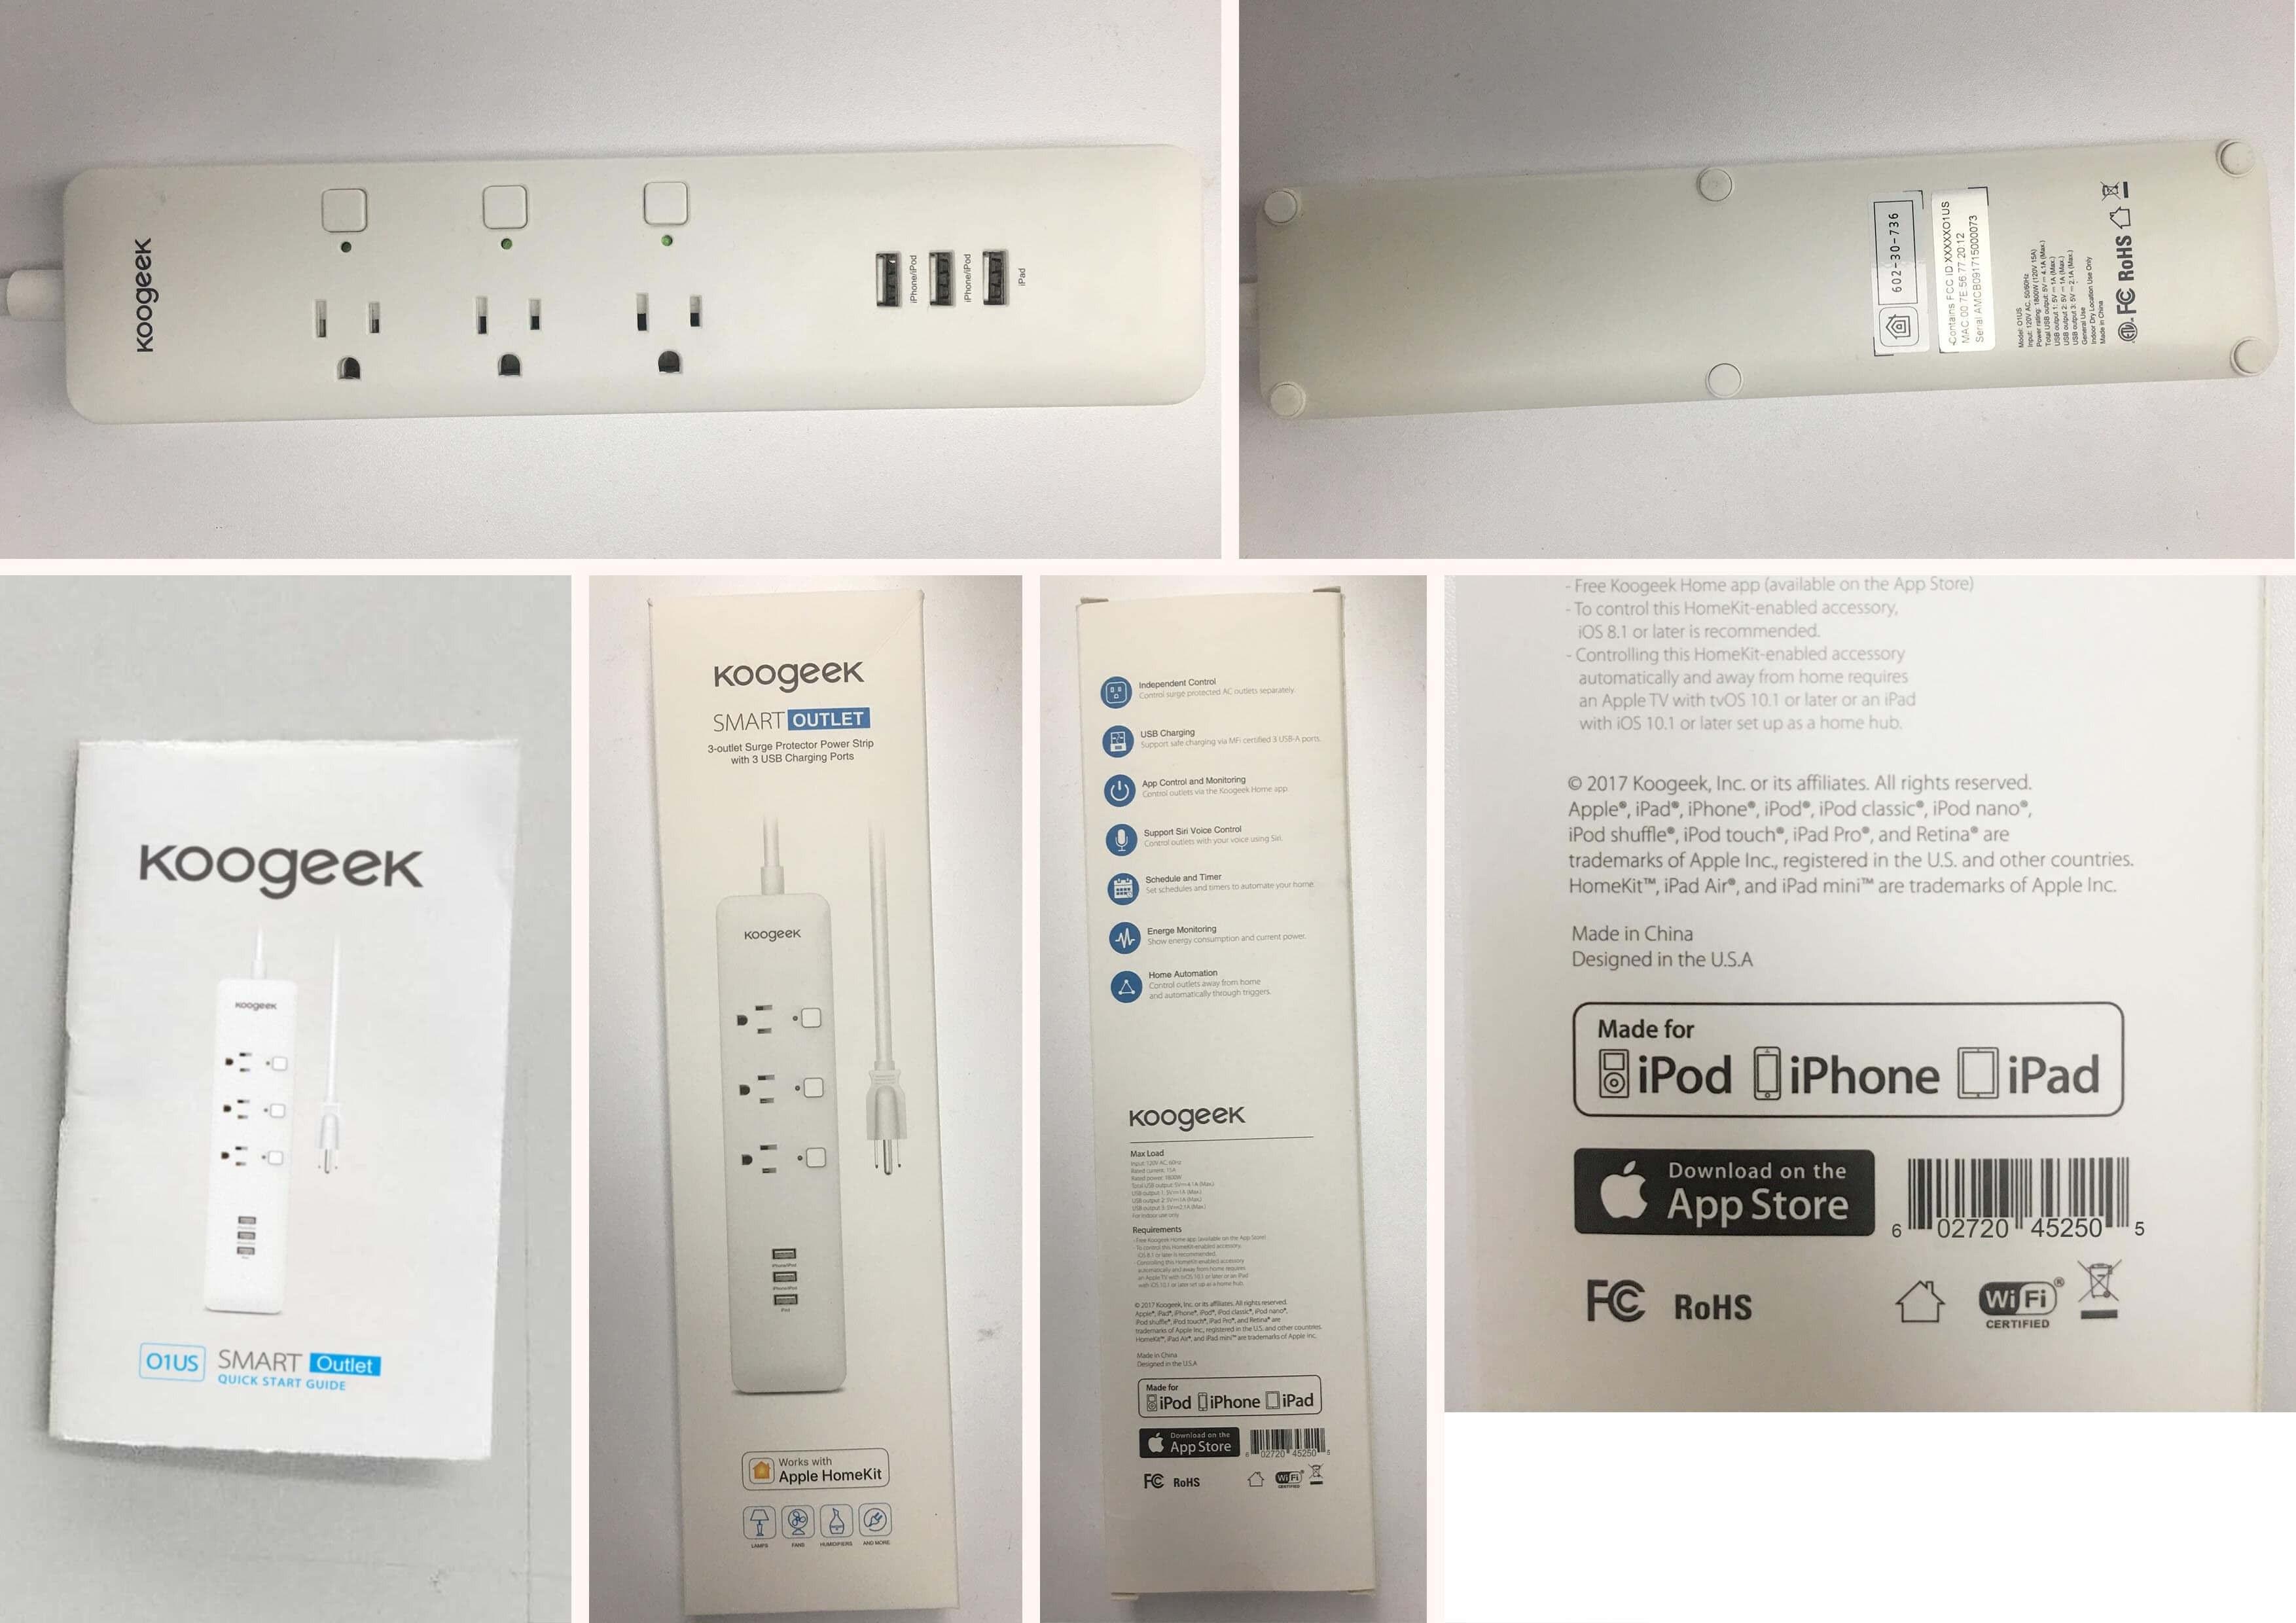 Wi-Fi Enabled Smart Outlet - Koogeek com